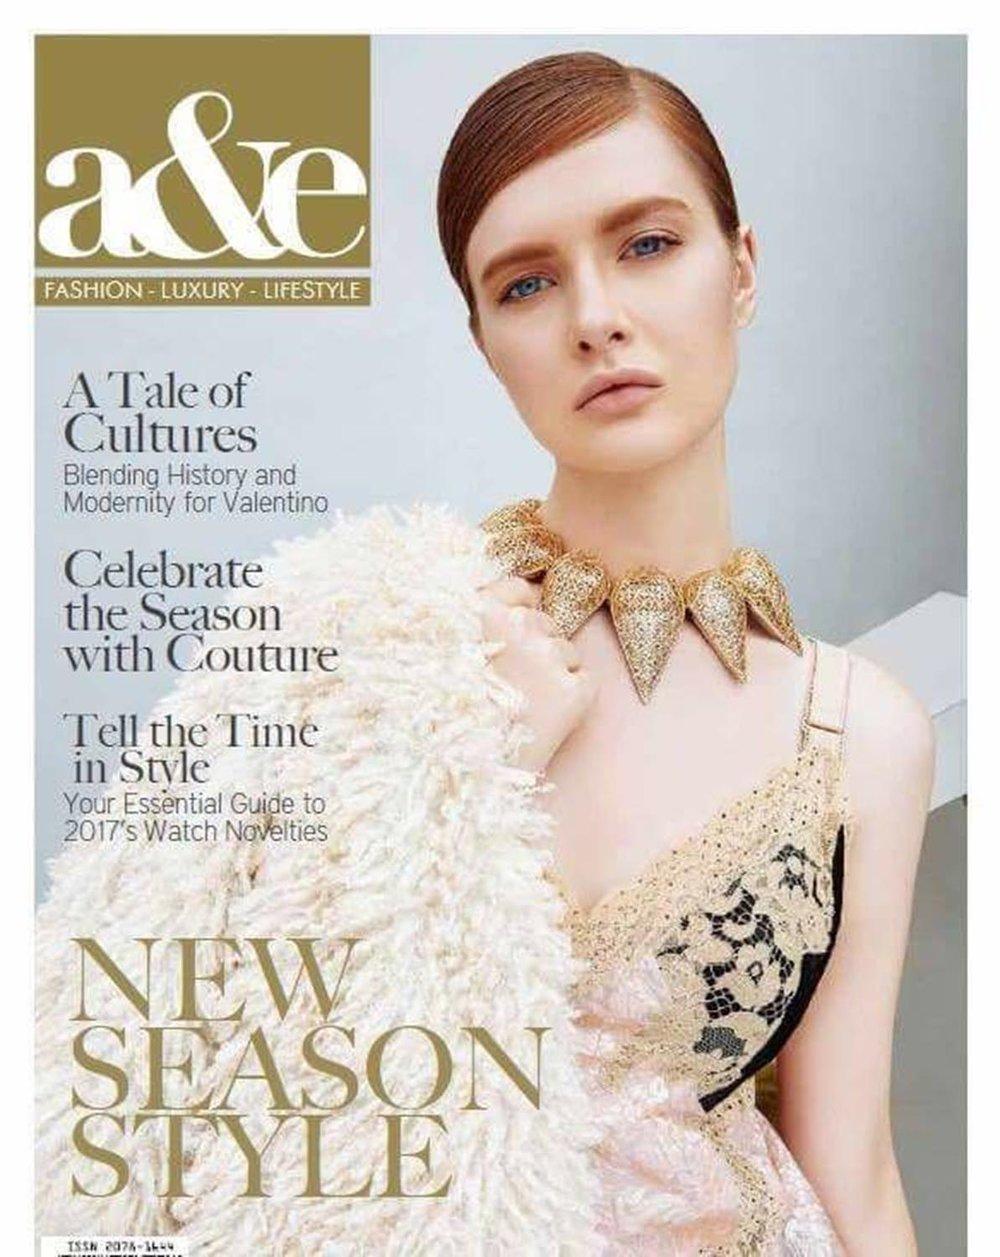 Issue 35 A+E Magazine Cover RM.jpg